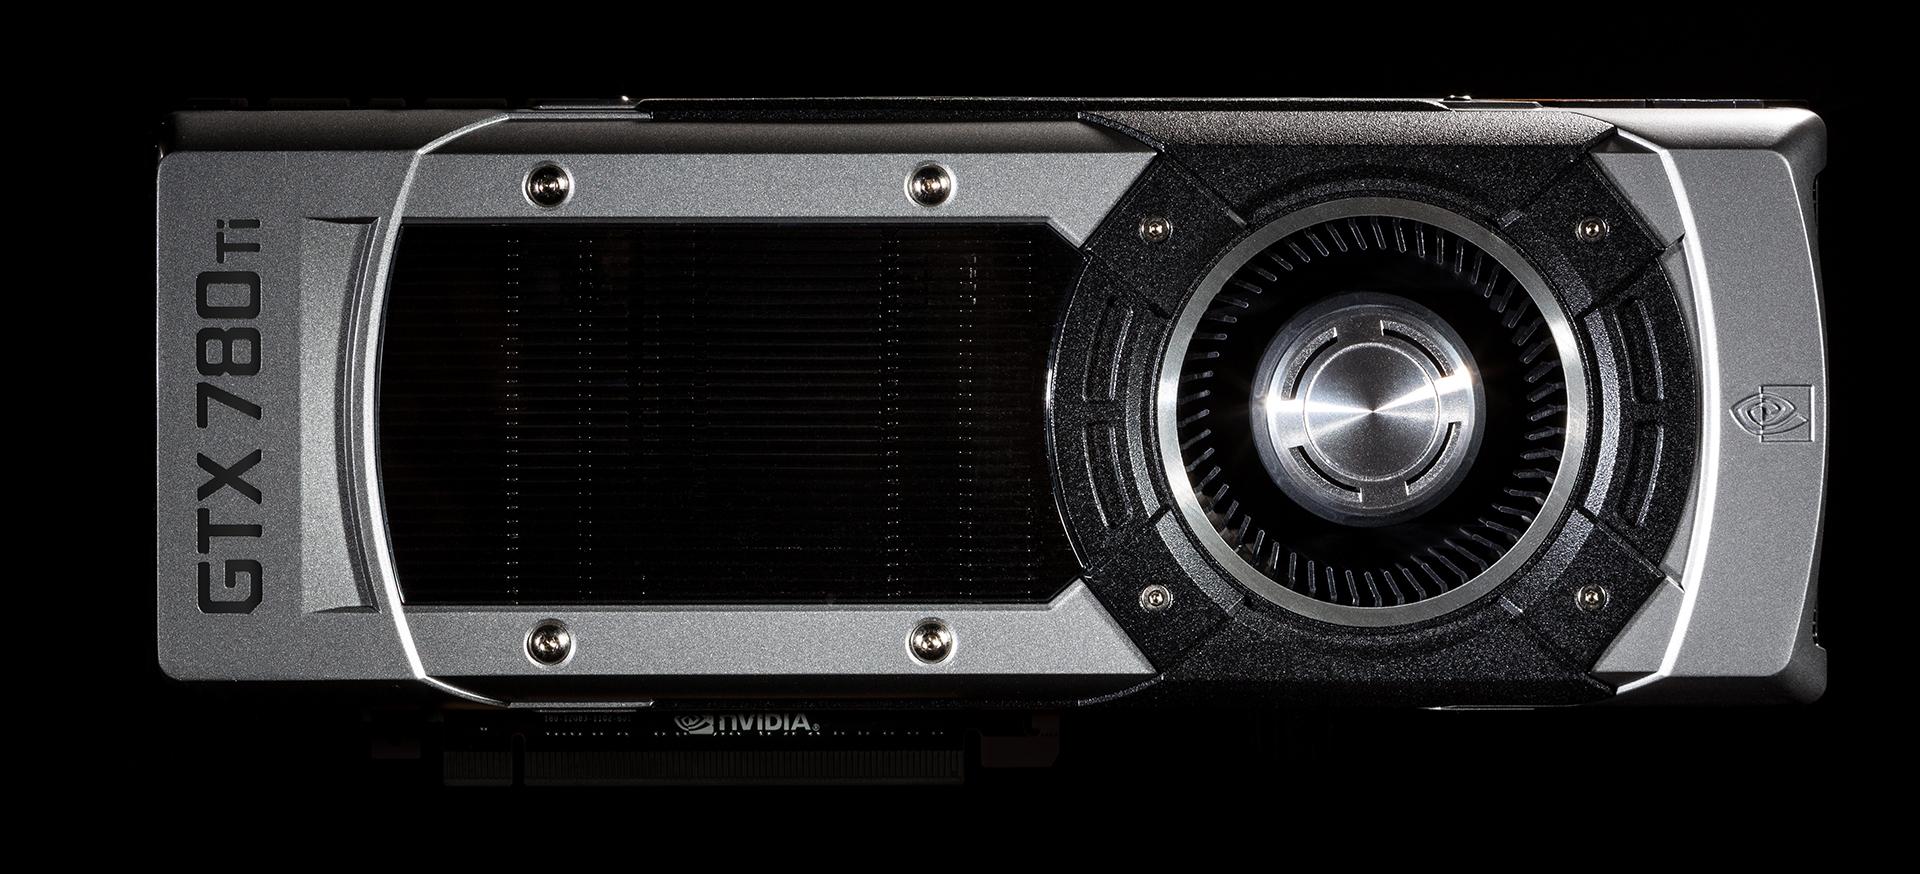 Gtx 780 release date NVIDIA GeForce GTX Specs, TechPowerUp GPU Database